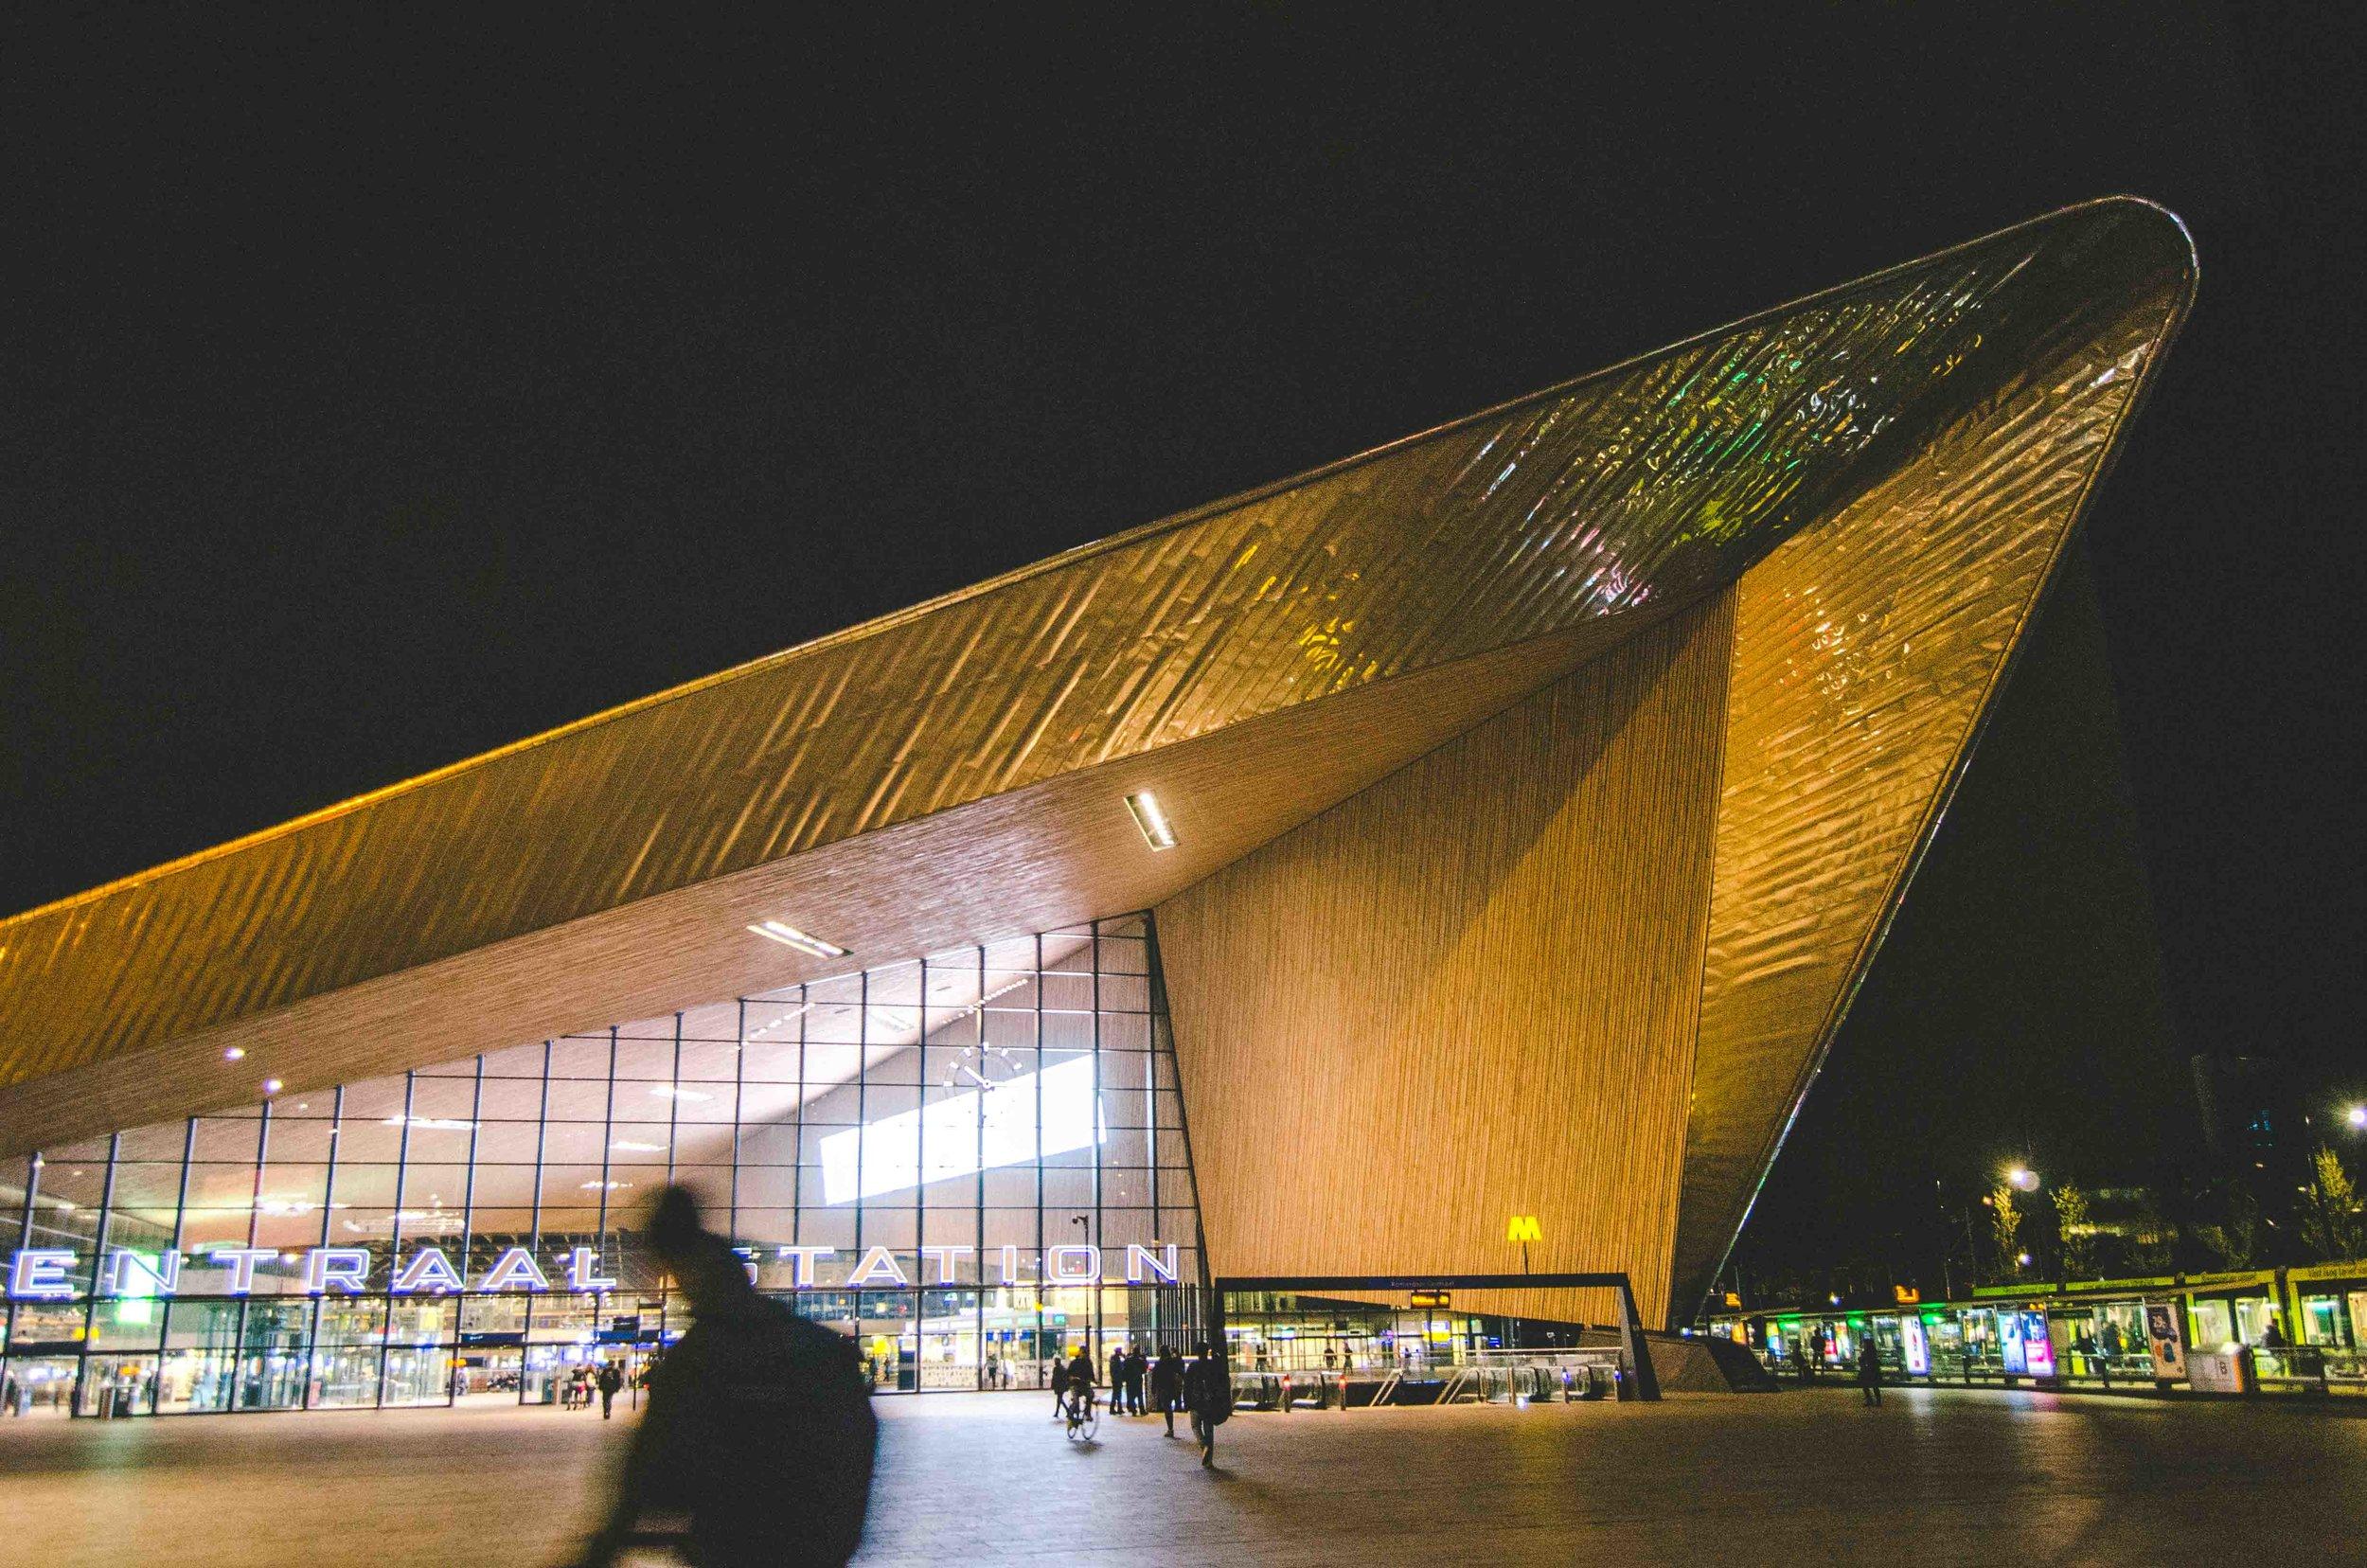 Rotterdam Centraal train station